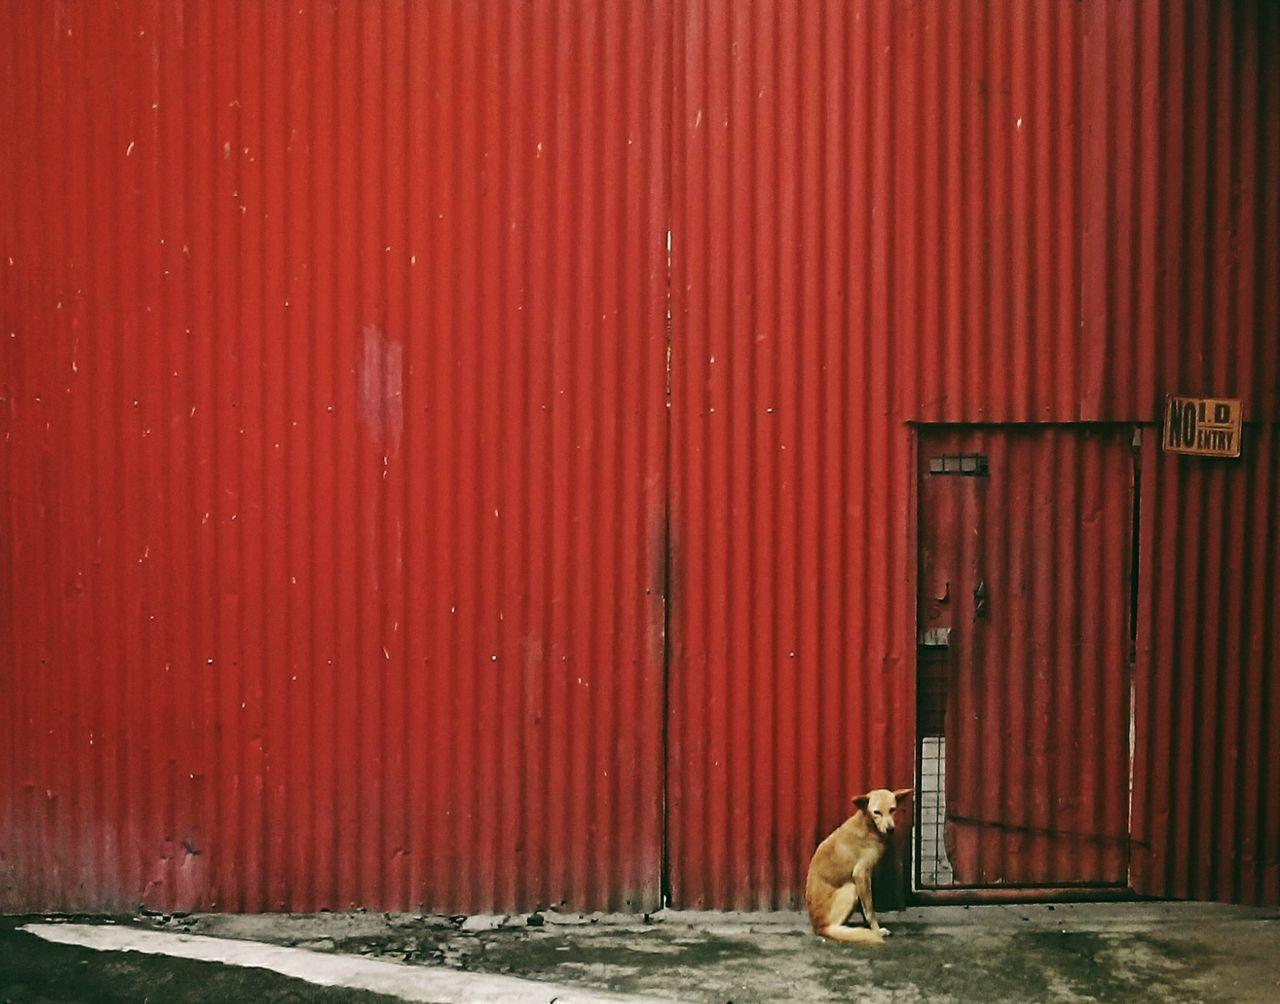 Dog Sitting Against Red Metallic Door